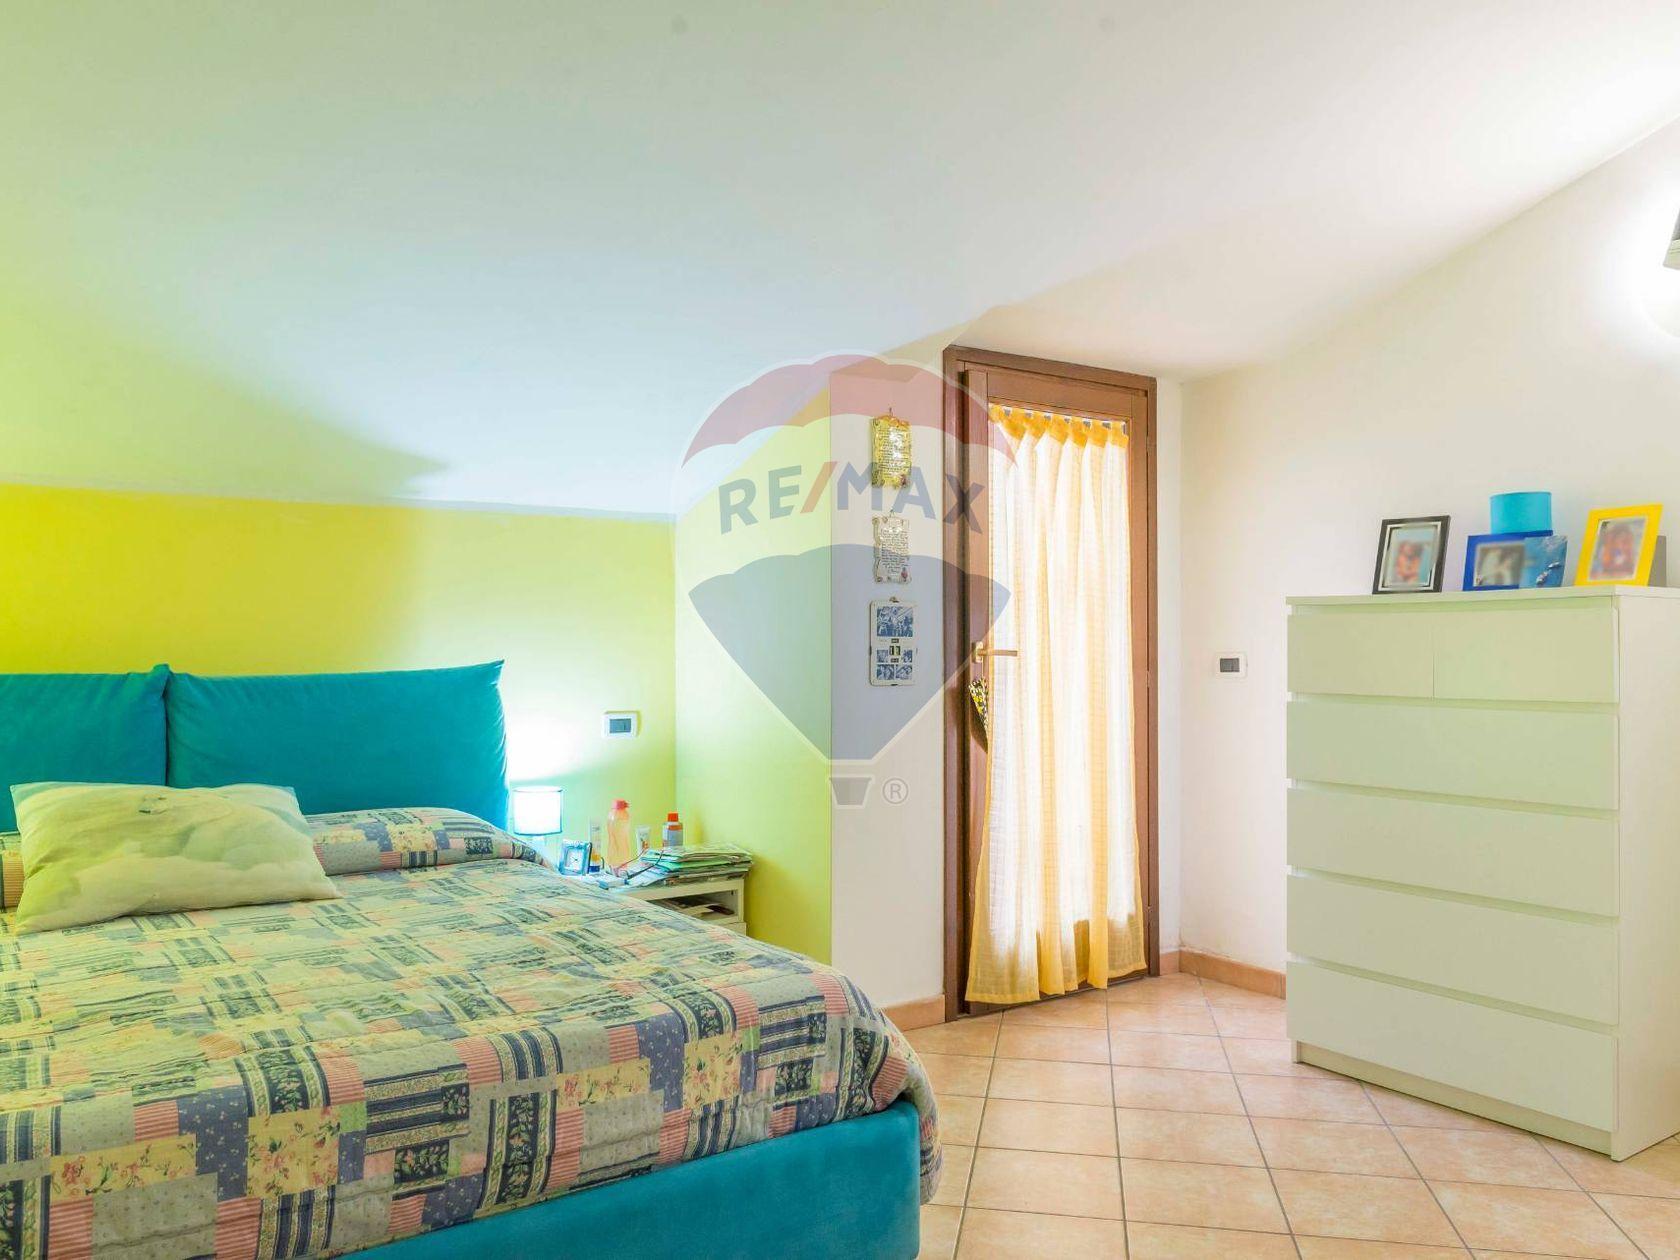 Villa o villino Marco Simone, Guidonia Montecelio, RM Vendita - Foto 4